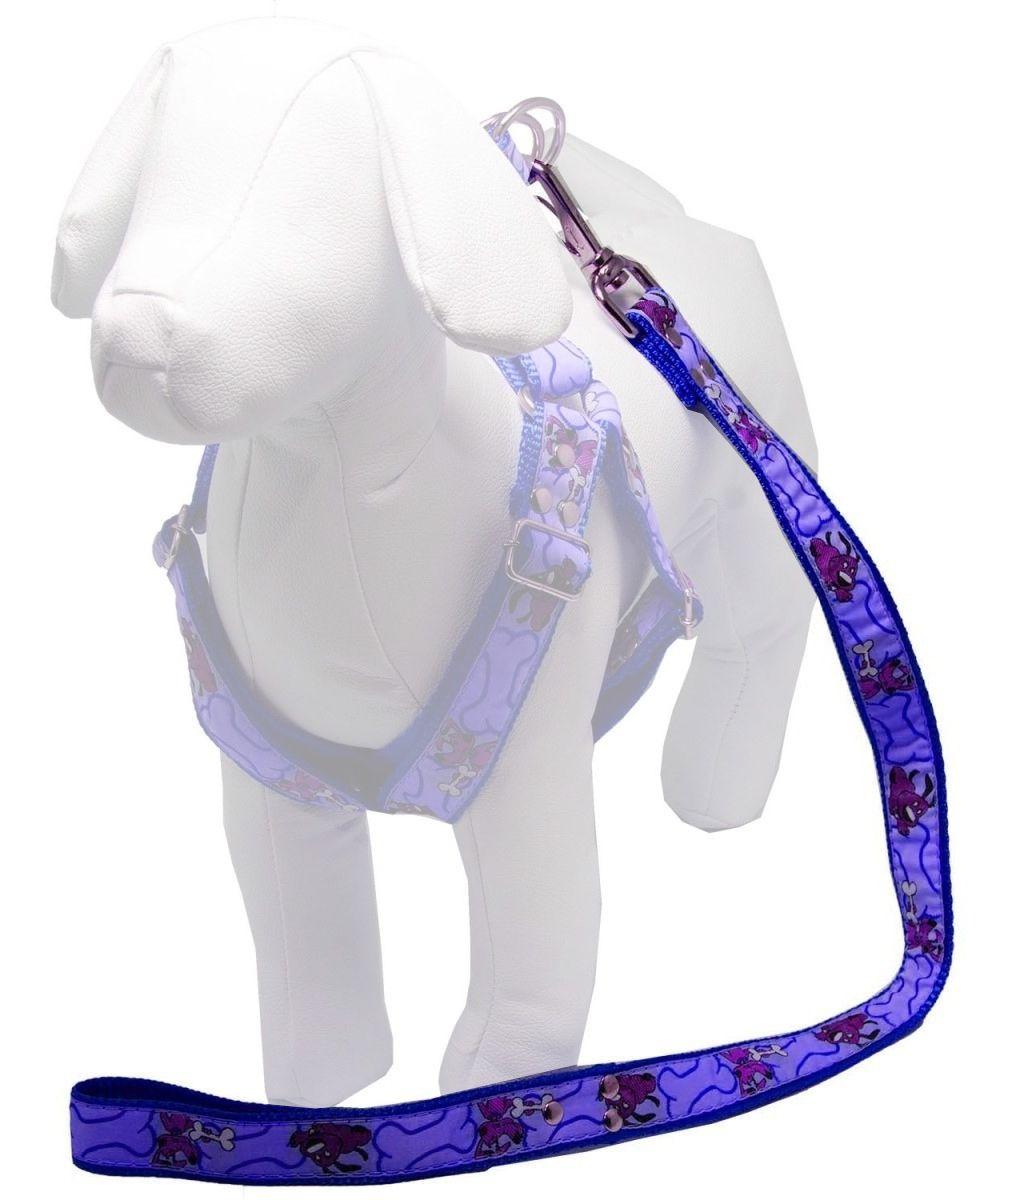 Guia de 1 Metro Resistente Para Cachorros de Menor Porte - Cor Azul